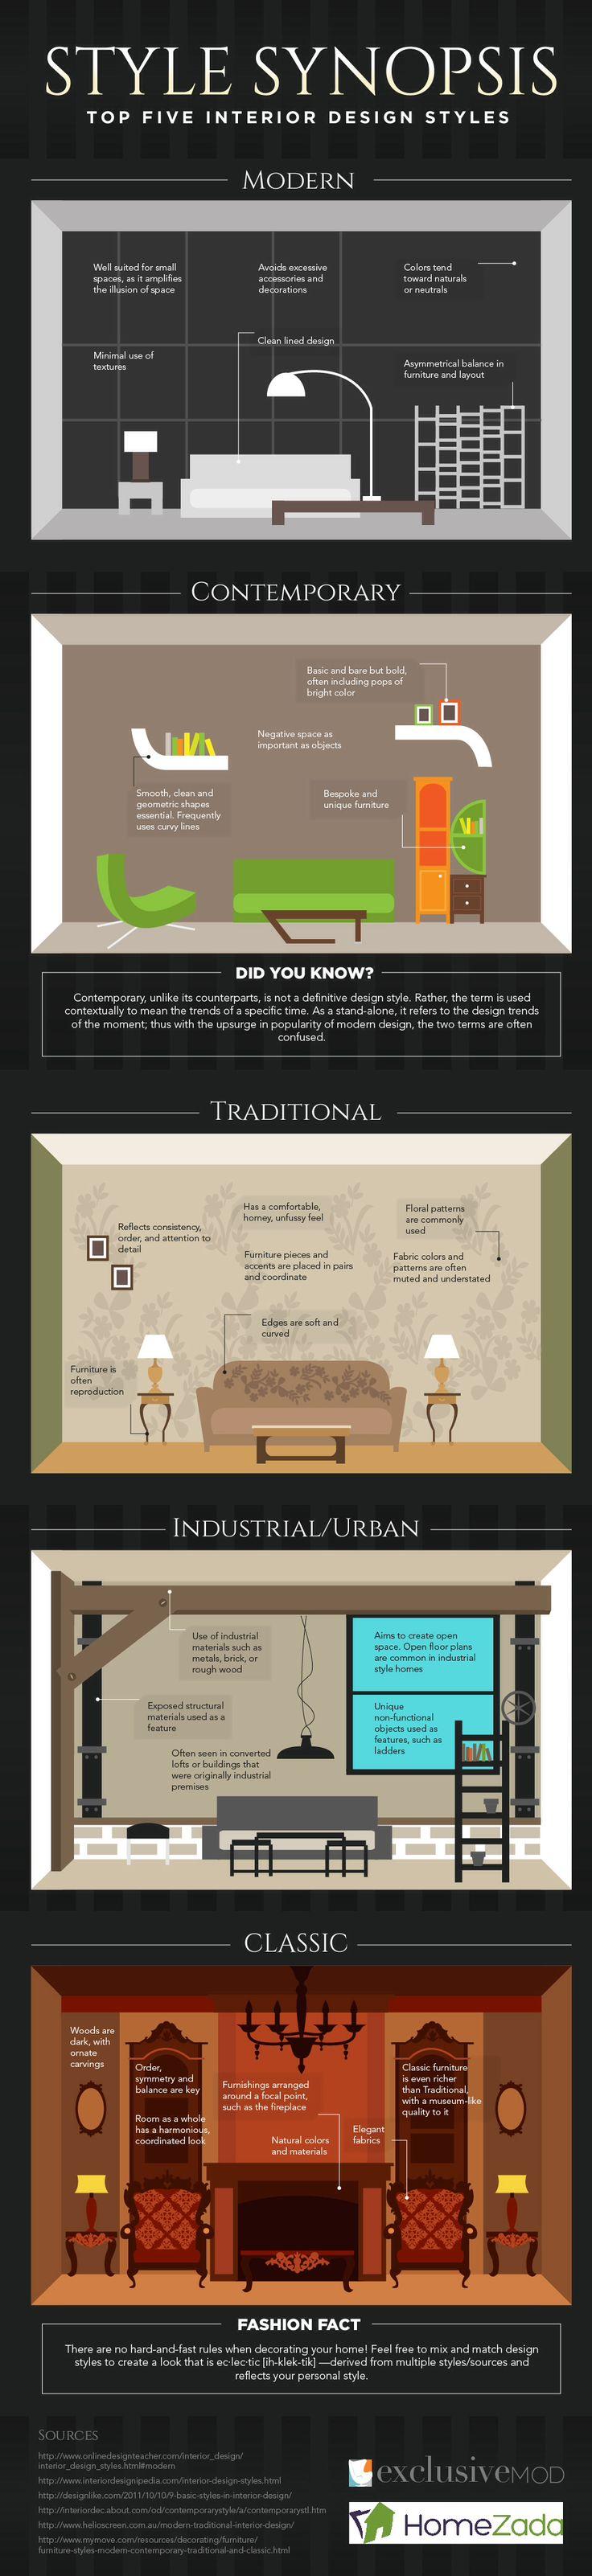 Top five interior design styles infographic